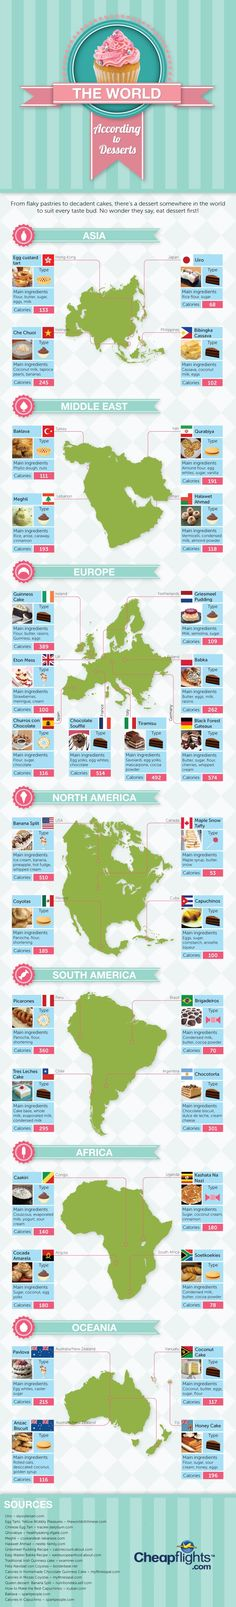 The World According To Desserts #Infographic #Dessert #Food